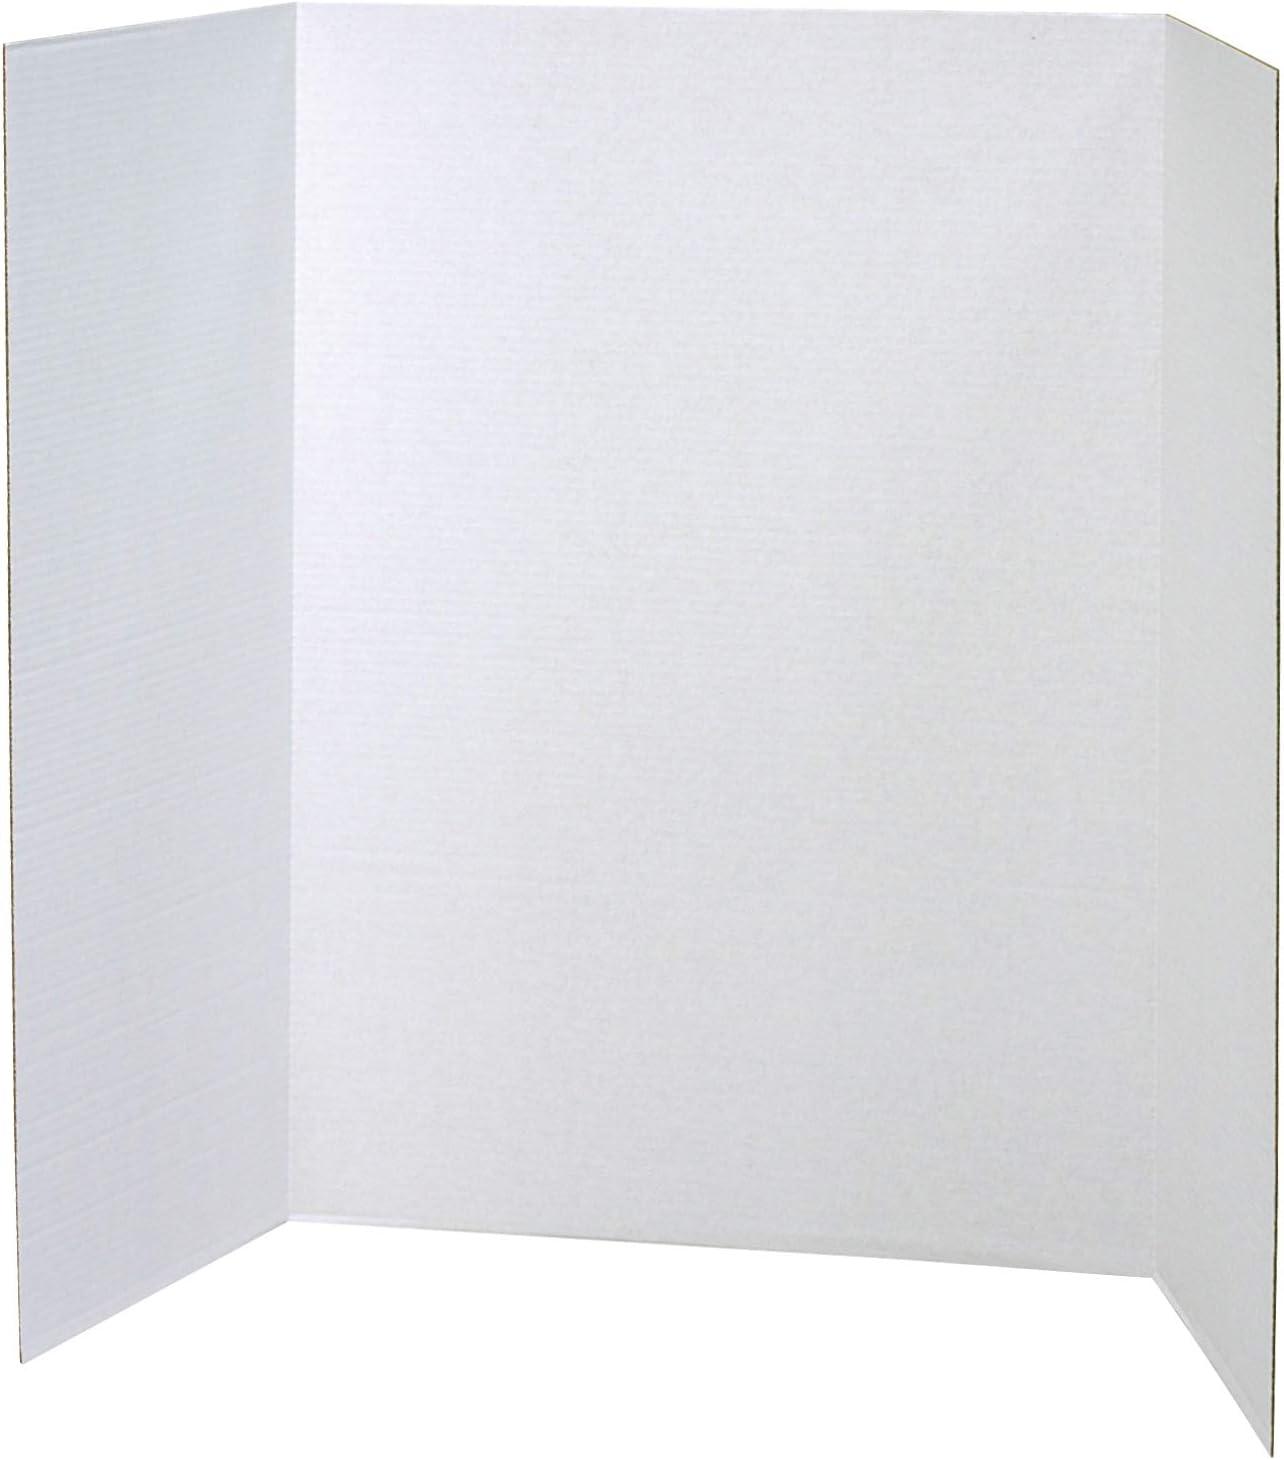 "Pacon Presentation Board, White, Single Wall, 48"" x 36"", 4 Boards : Presentation And Display Boards : Office Products"